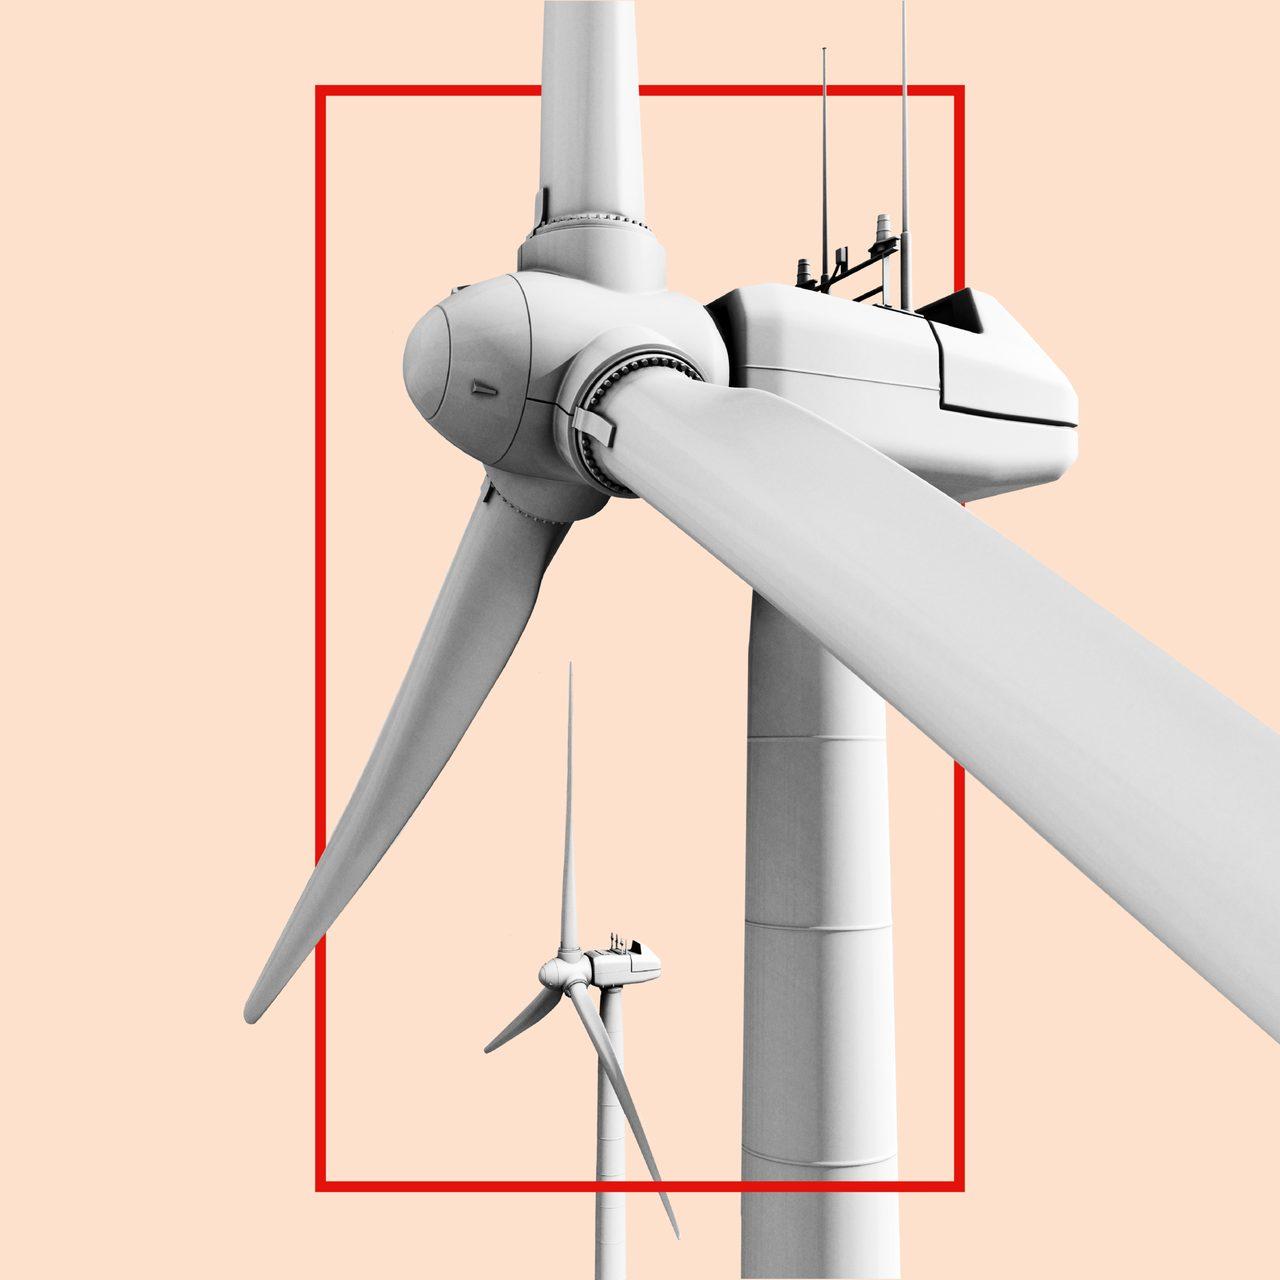 Wind turbine, Windmill, Propeller, Line